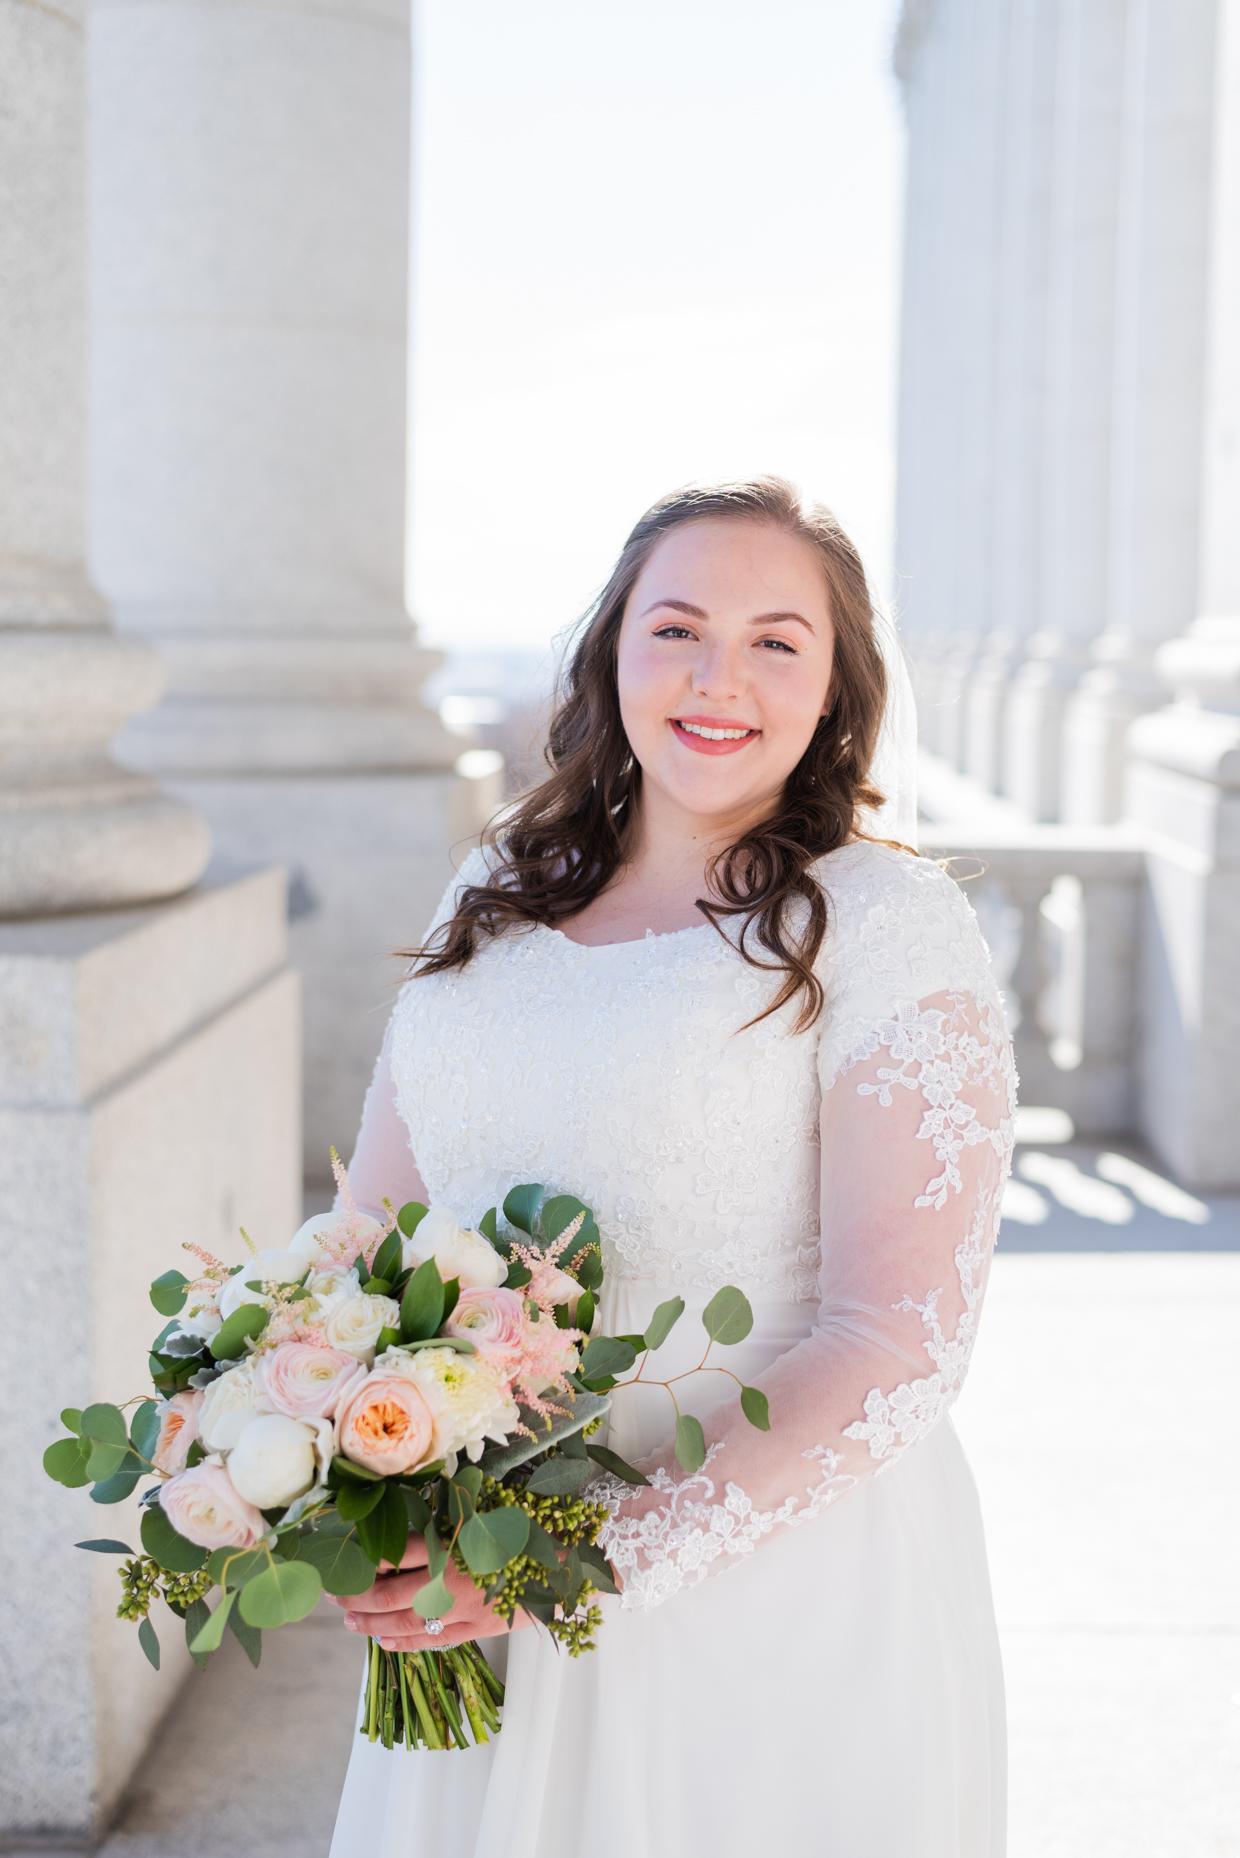 bailey.dayel bridals-8.jpg